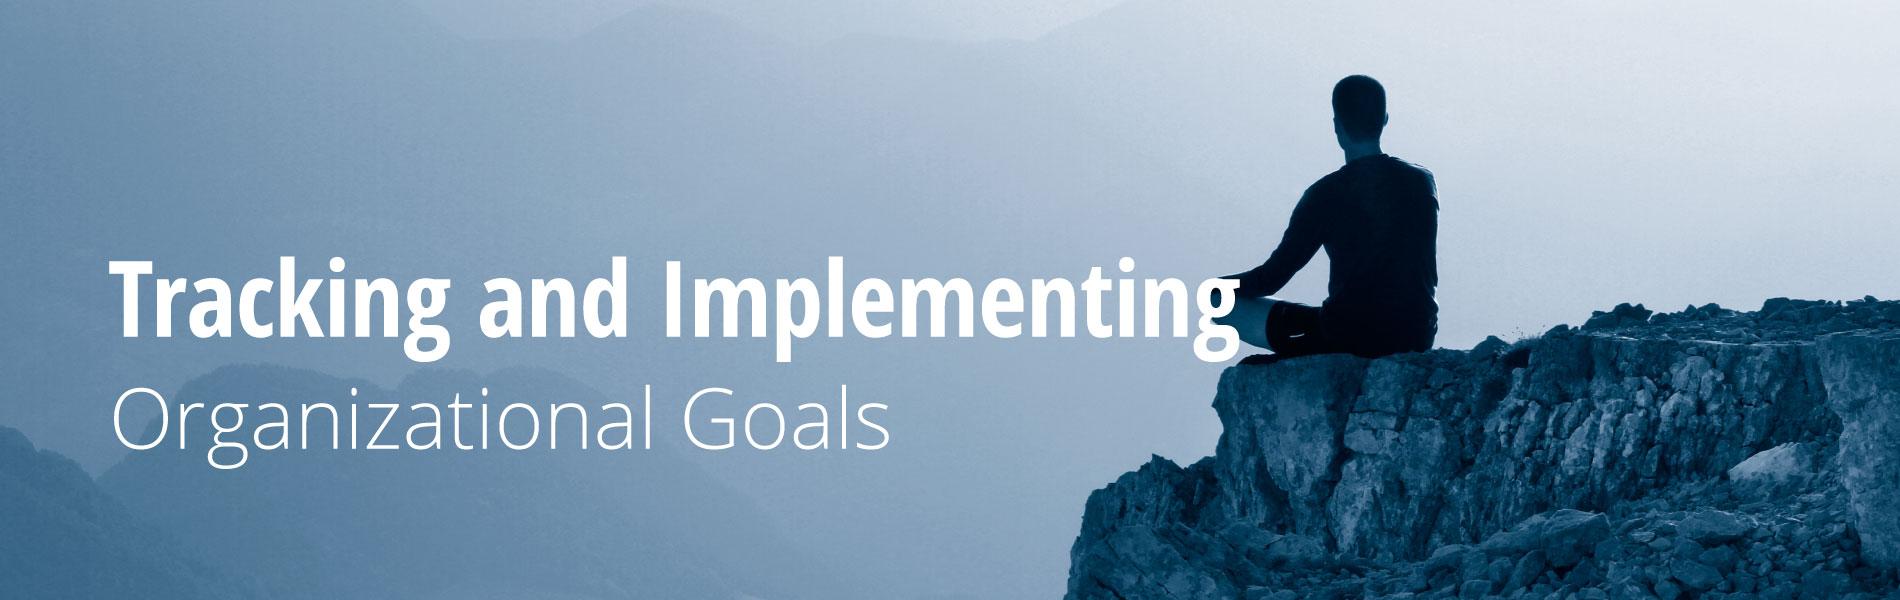 trackingandimplementingorganizationalgoals-1900x600.jpg